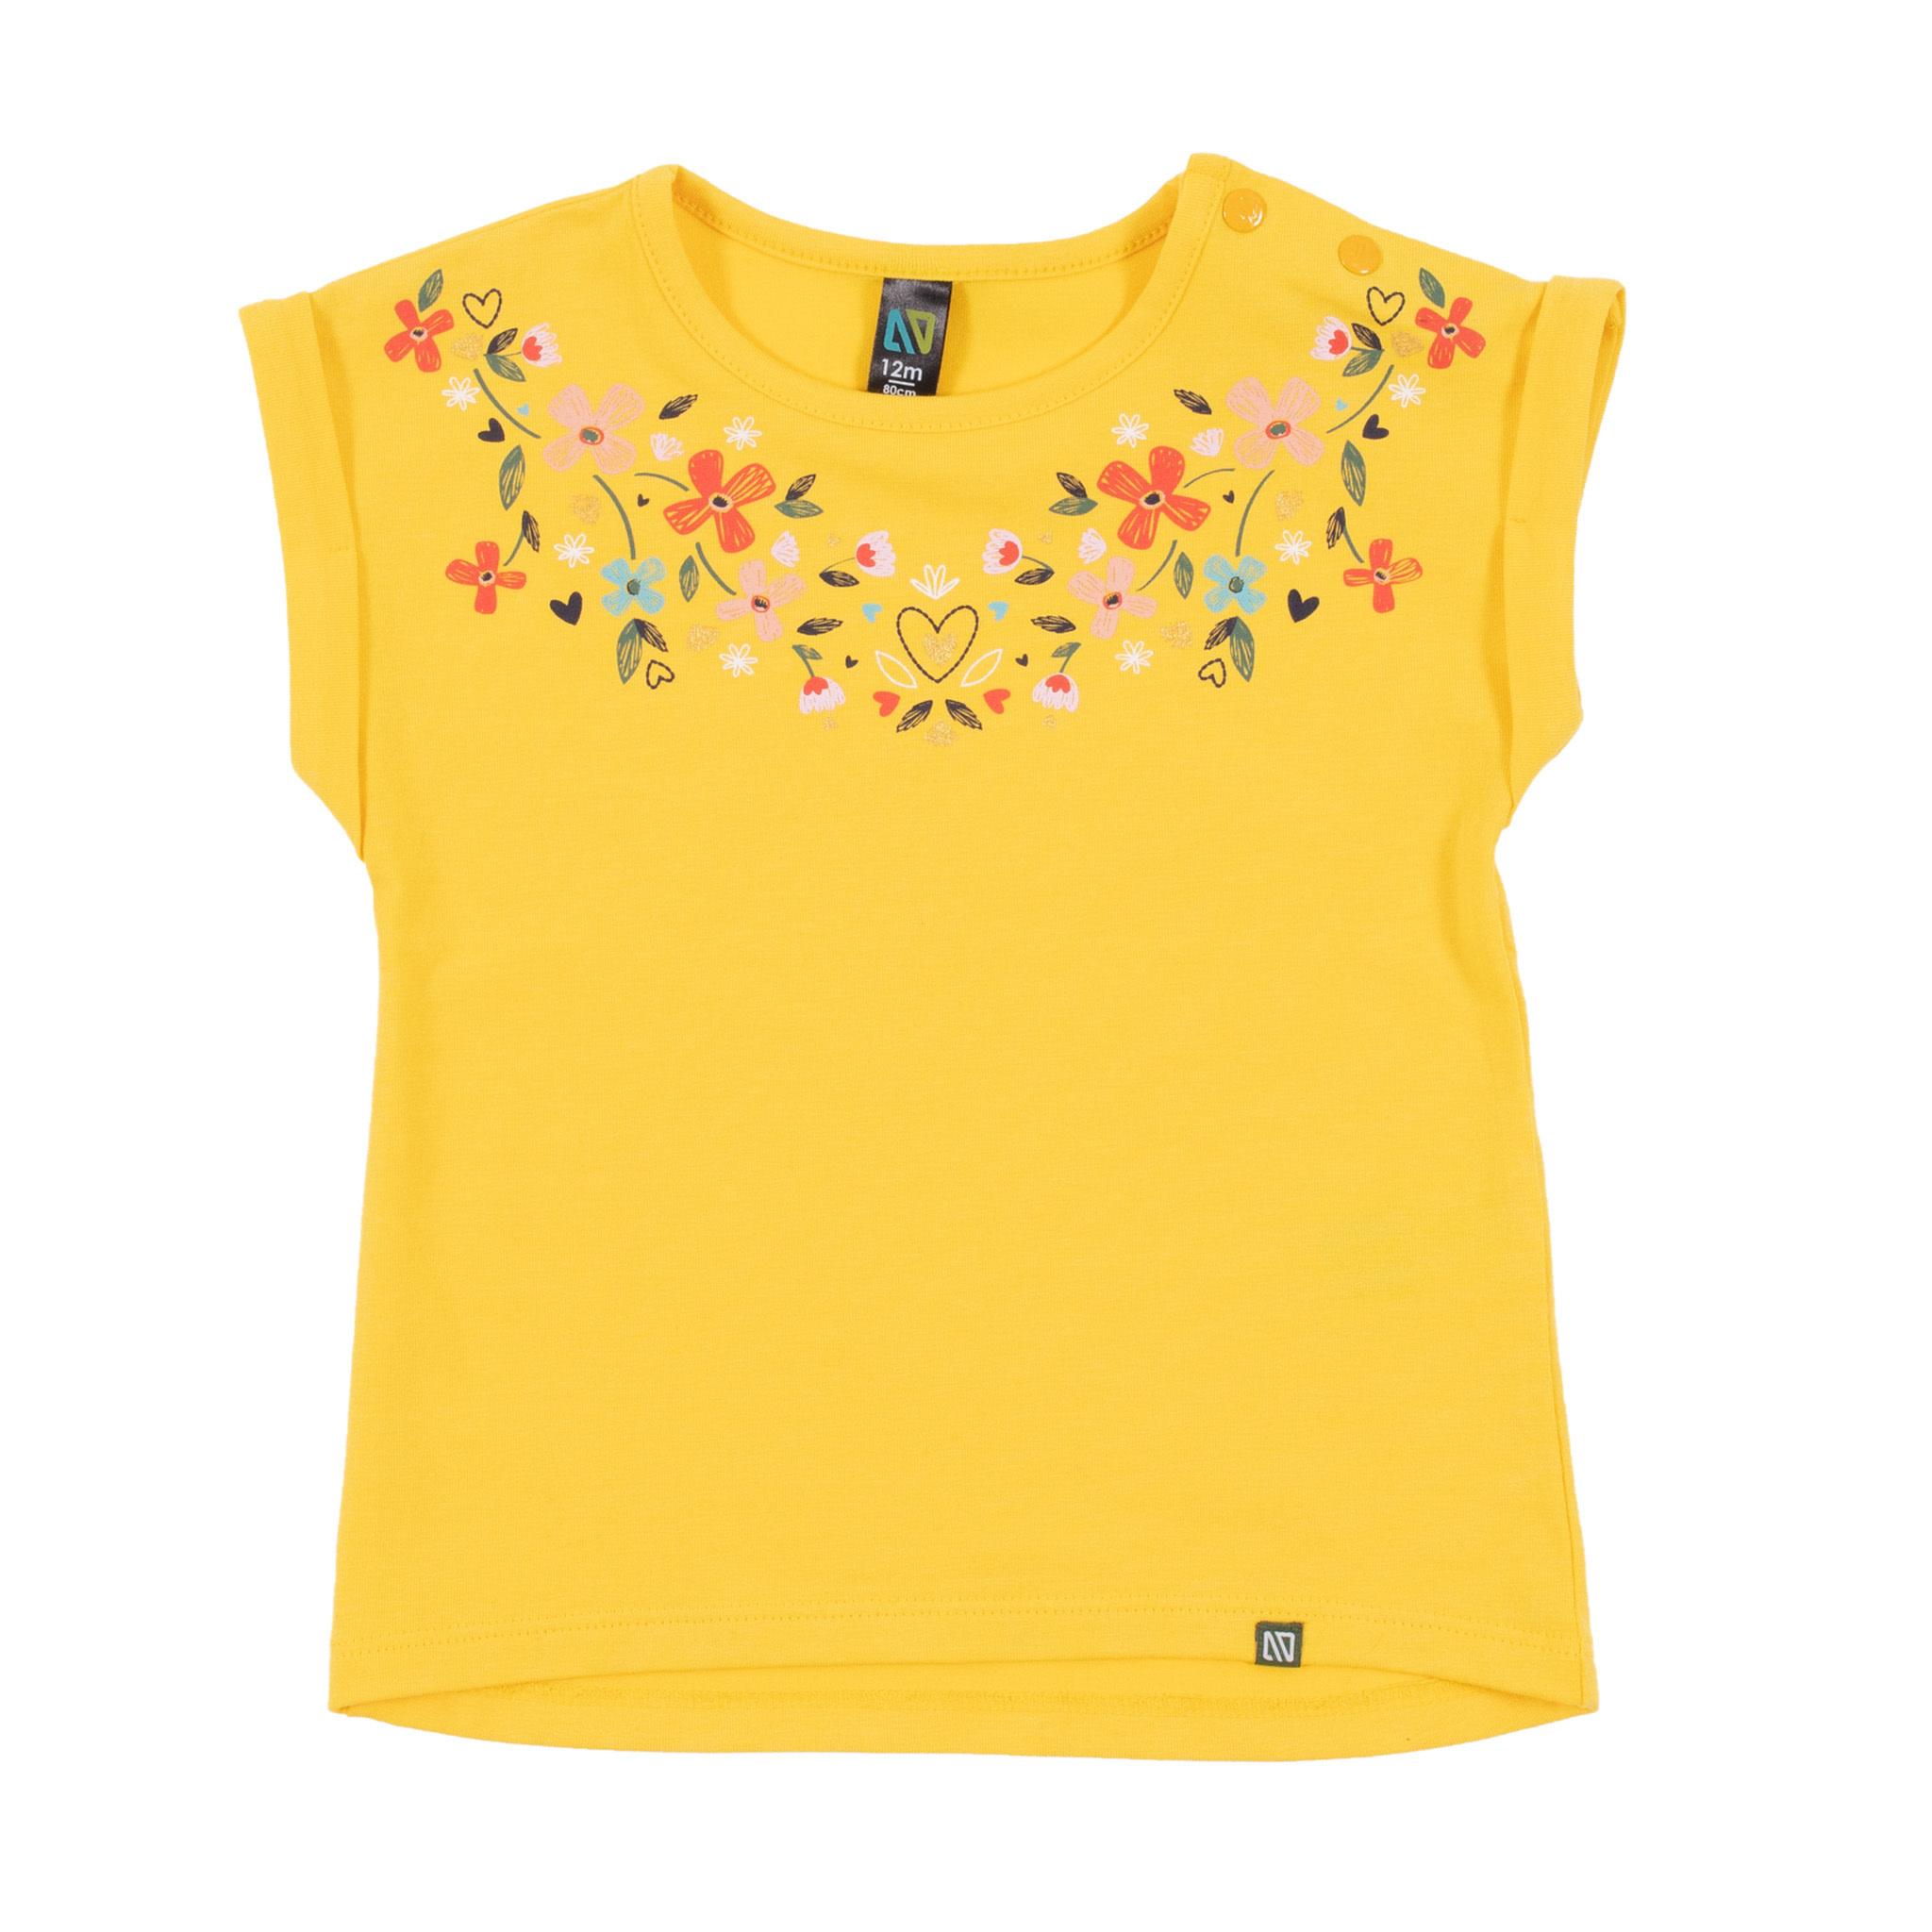 T-Shirt Rayon de soleil-1